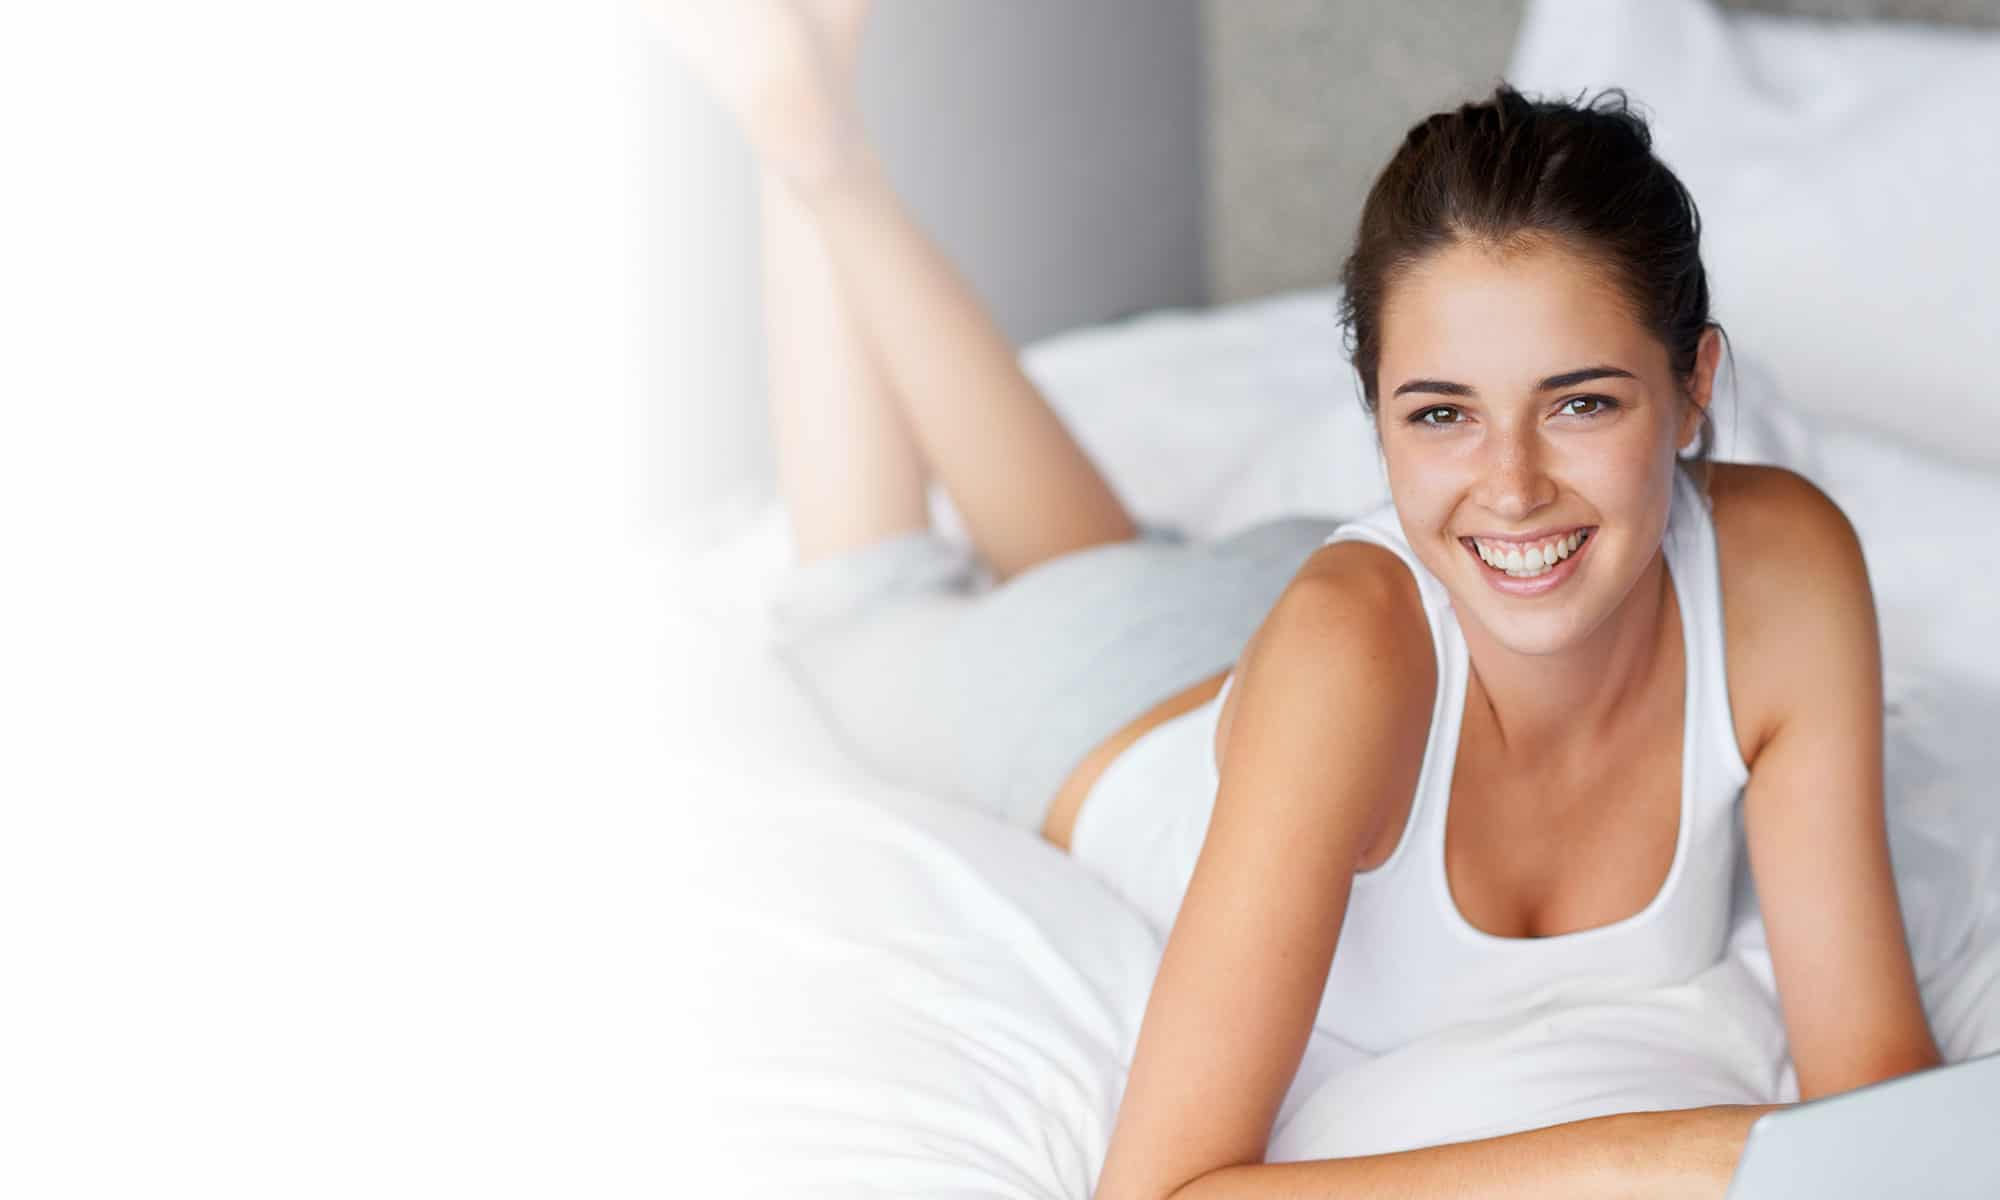 Motiva Implantate - Brustvergrösserung